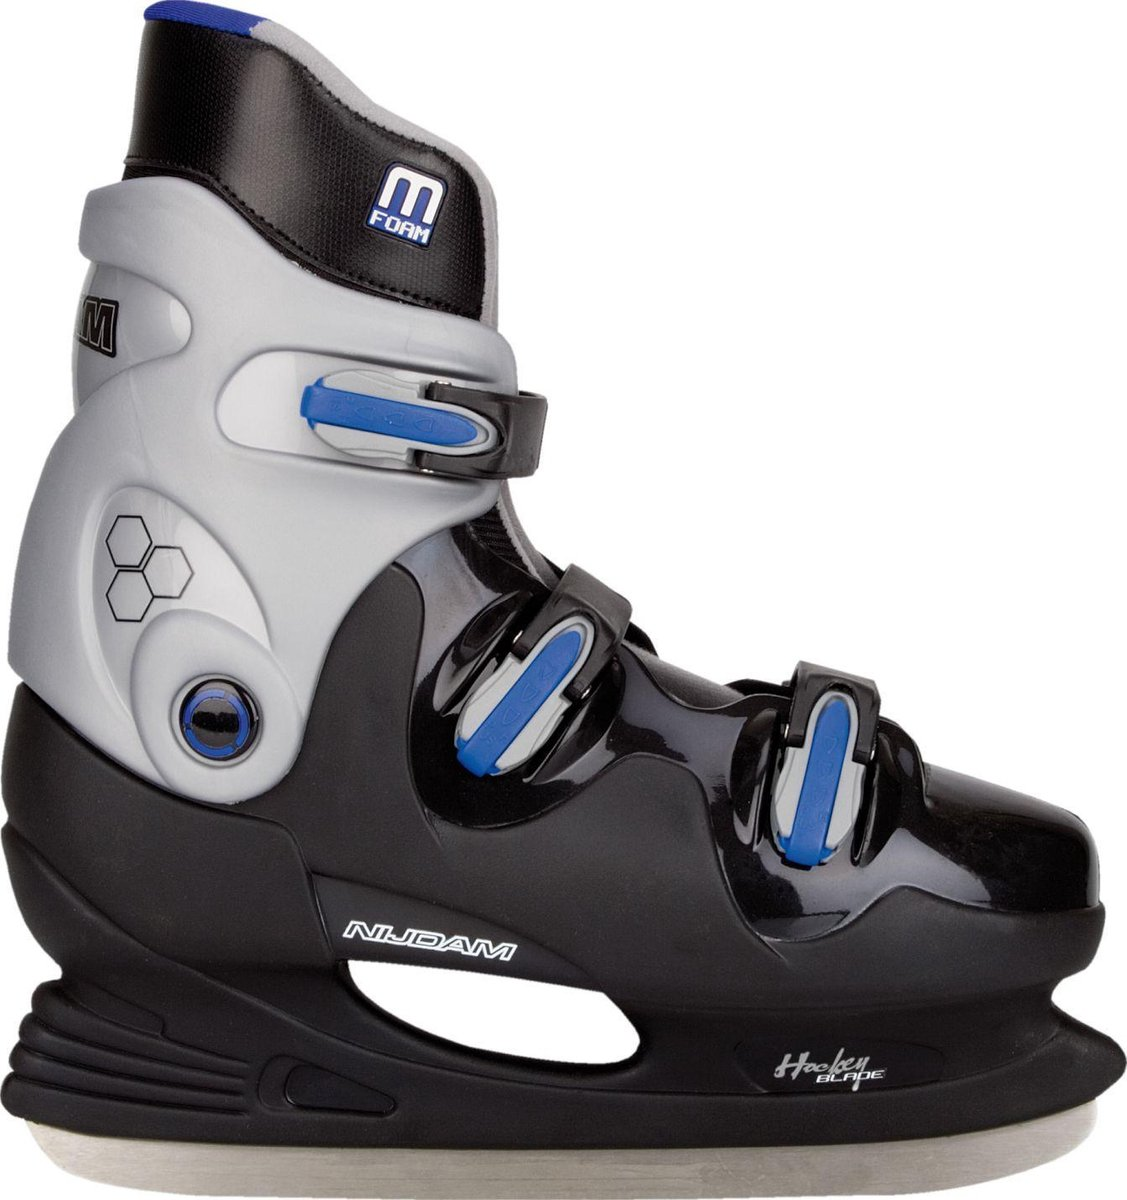 Nijdam IJshockeyschaats - Hardboot - Zwart/Blauw - Maat 38